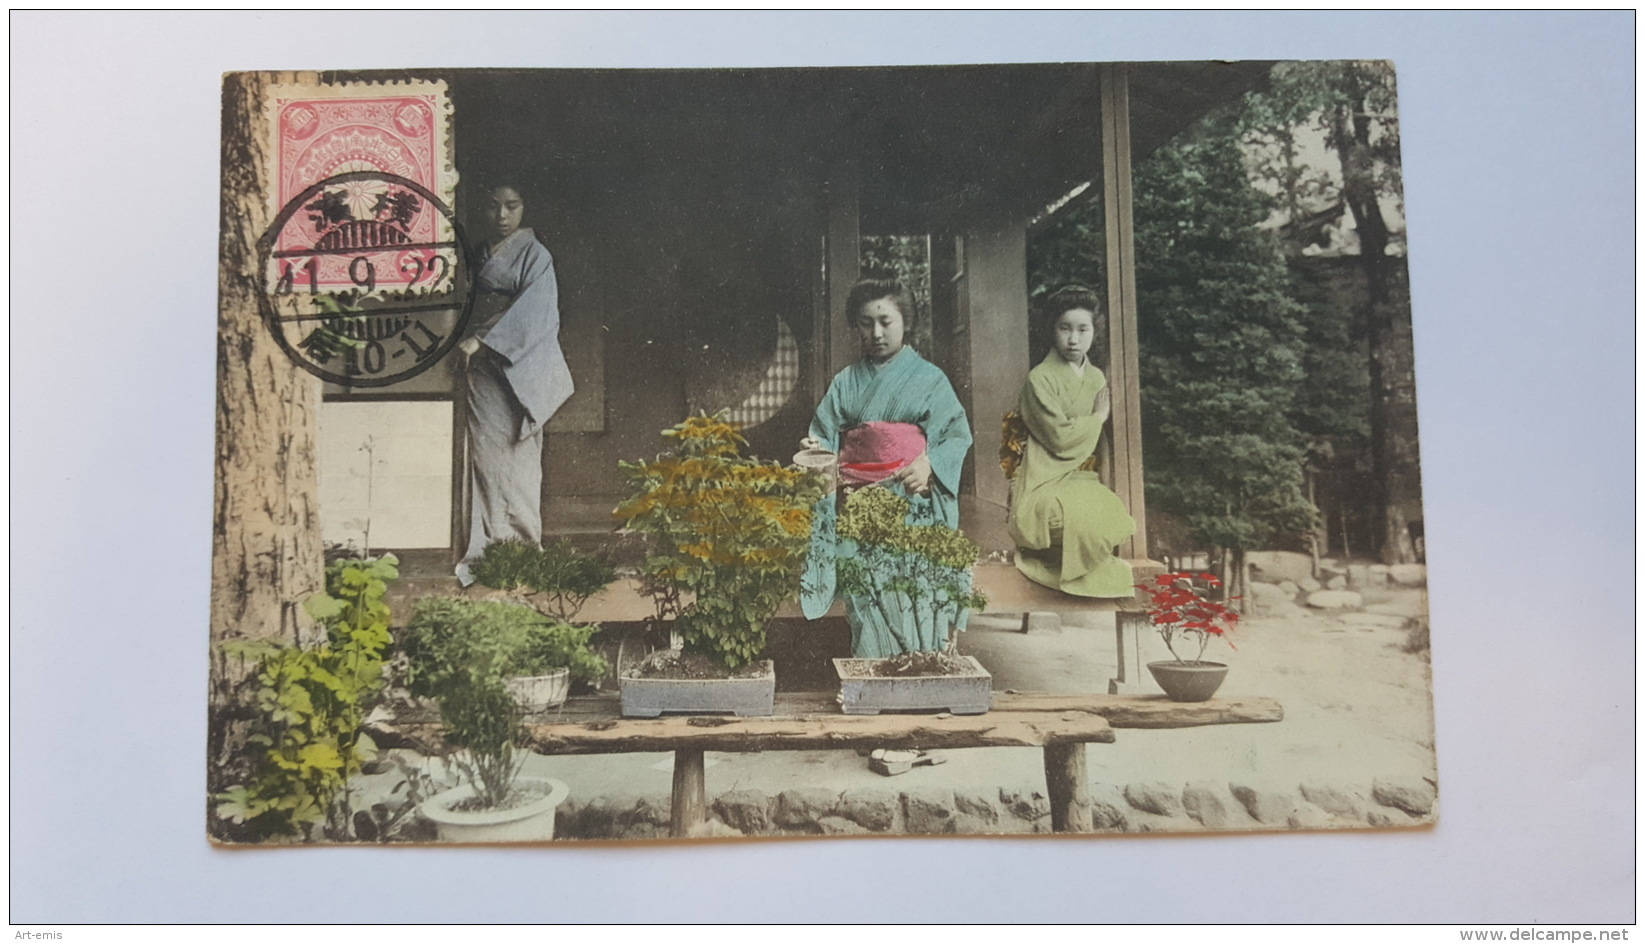 FEMME ASIE CPA Animee Postcard - Postcards